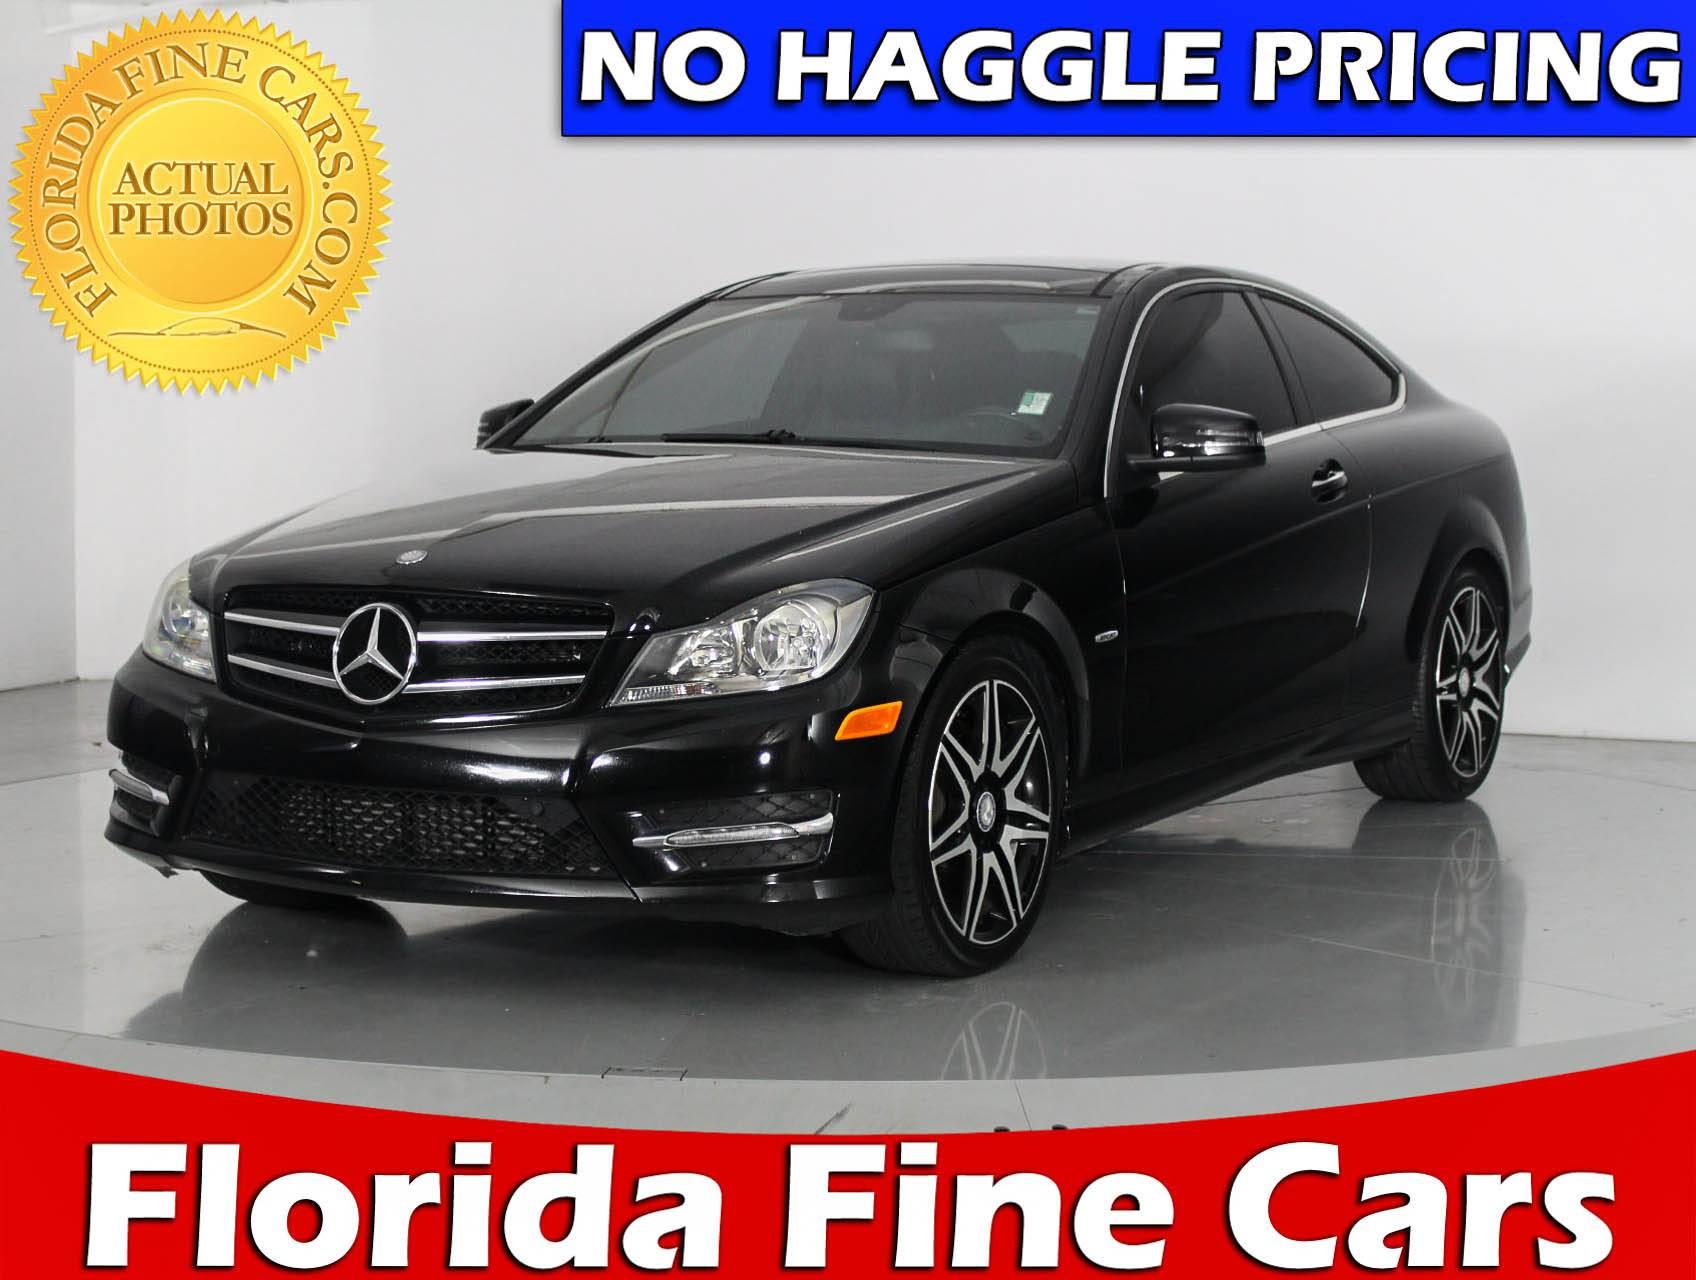 /CarsForSale/MERCEDES-BENZ-C CLASS-2013-WEST PALM-FL-Stock=83874